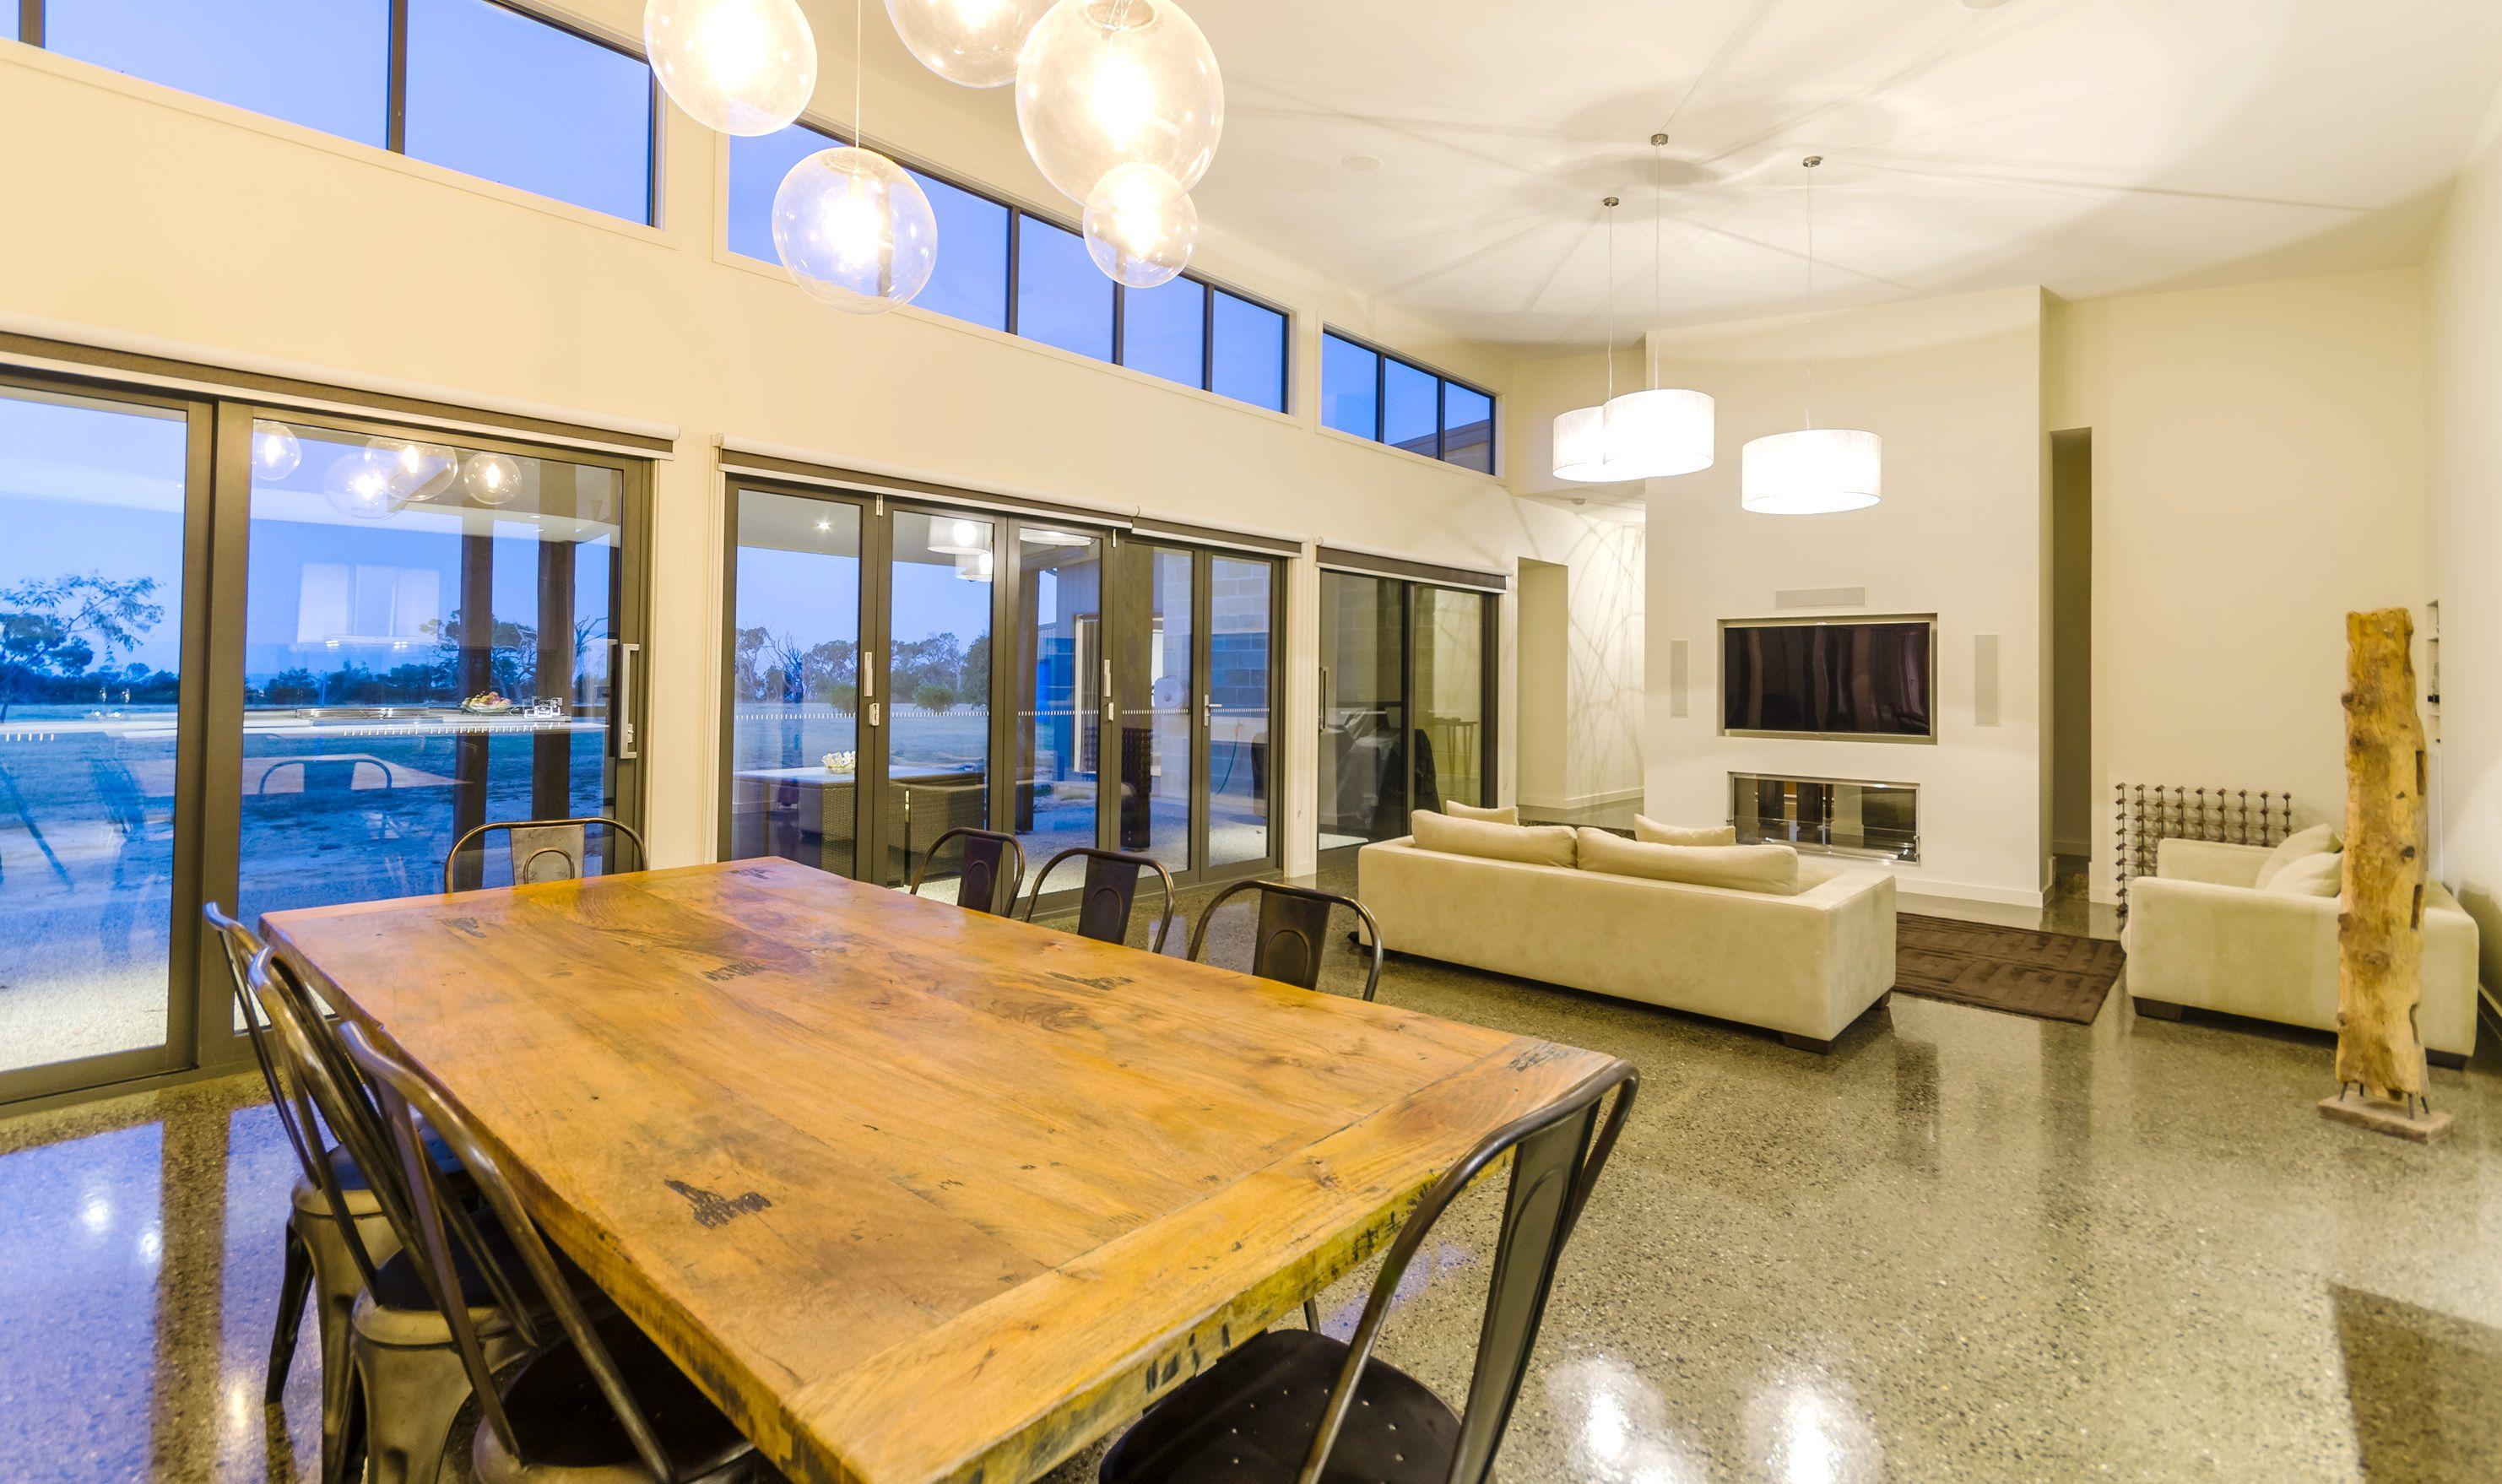 Acreage Designs Pivot Homes House design, Home design